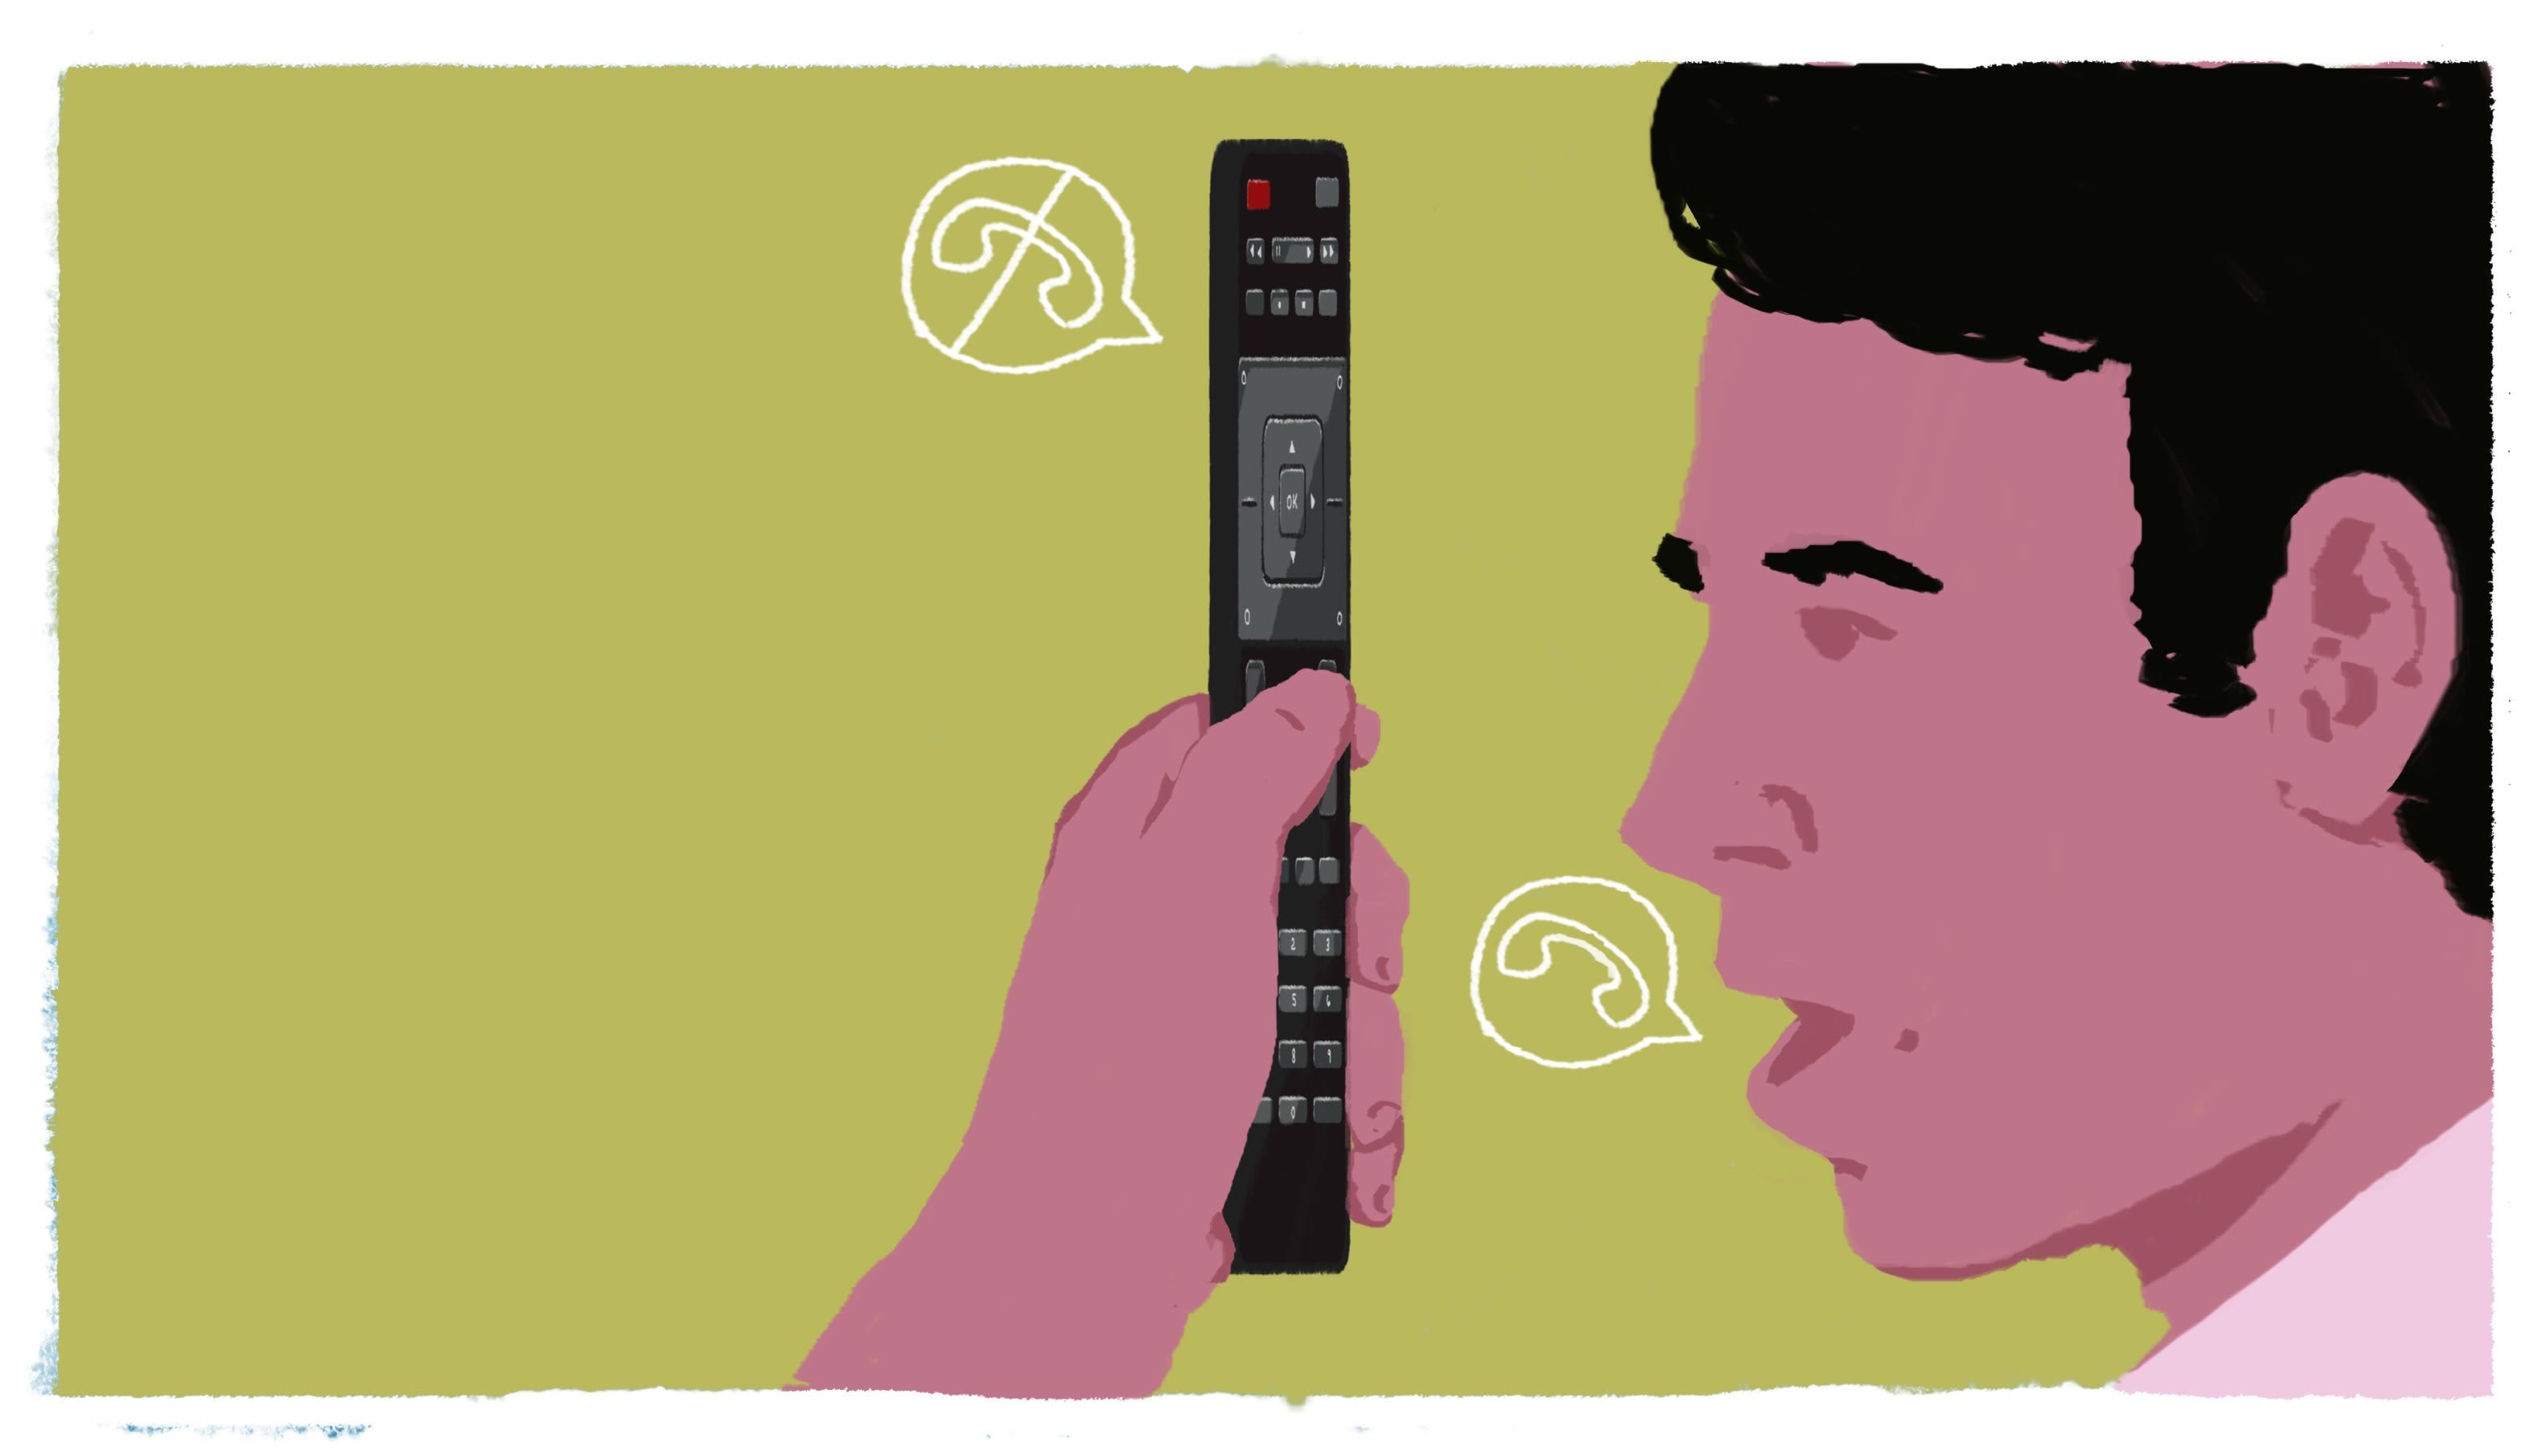 noble-trainer-illustration-remote